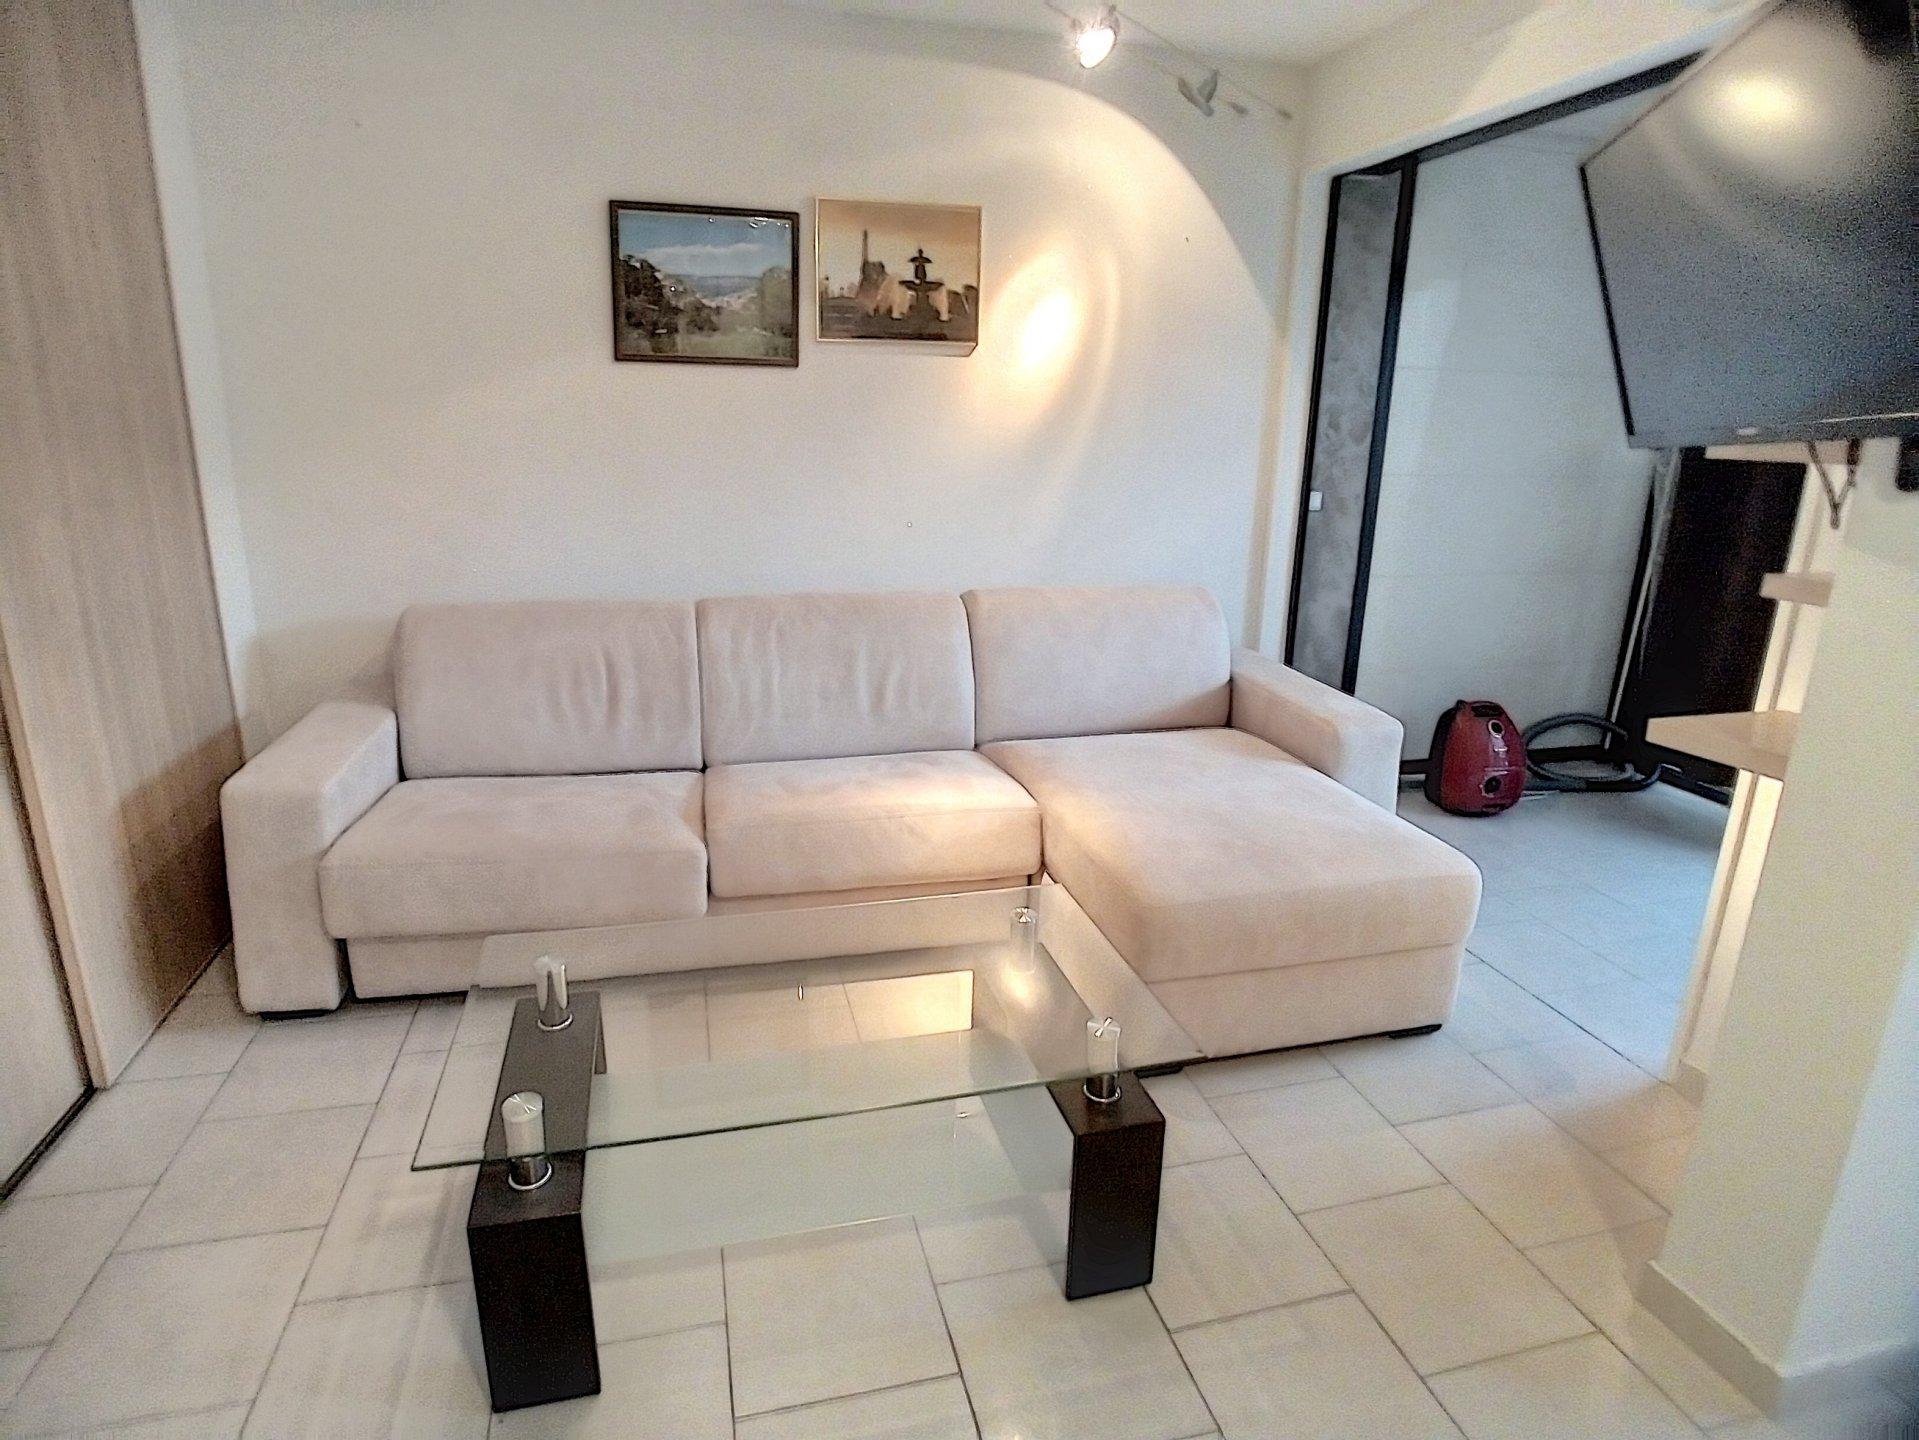 Studio, Mandelieu Minelle, in luxury residence